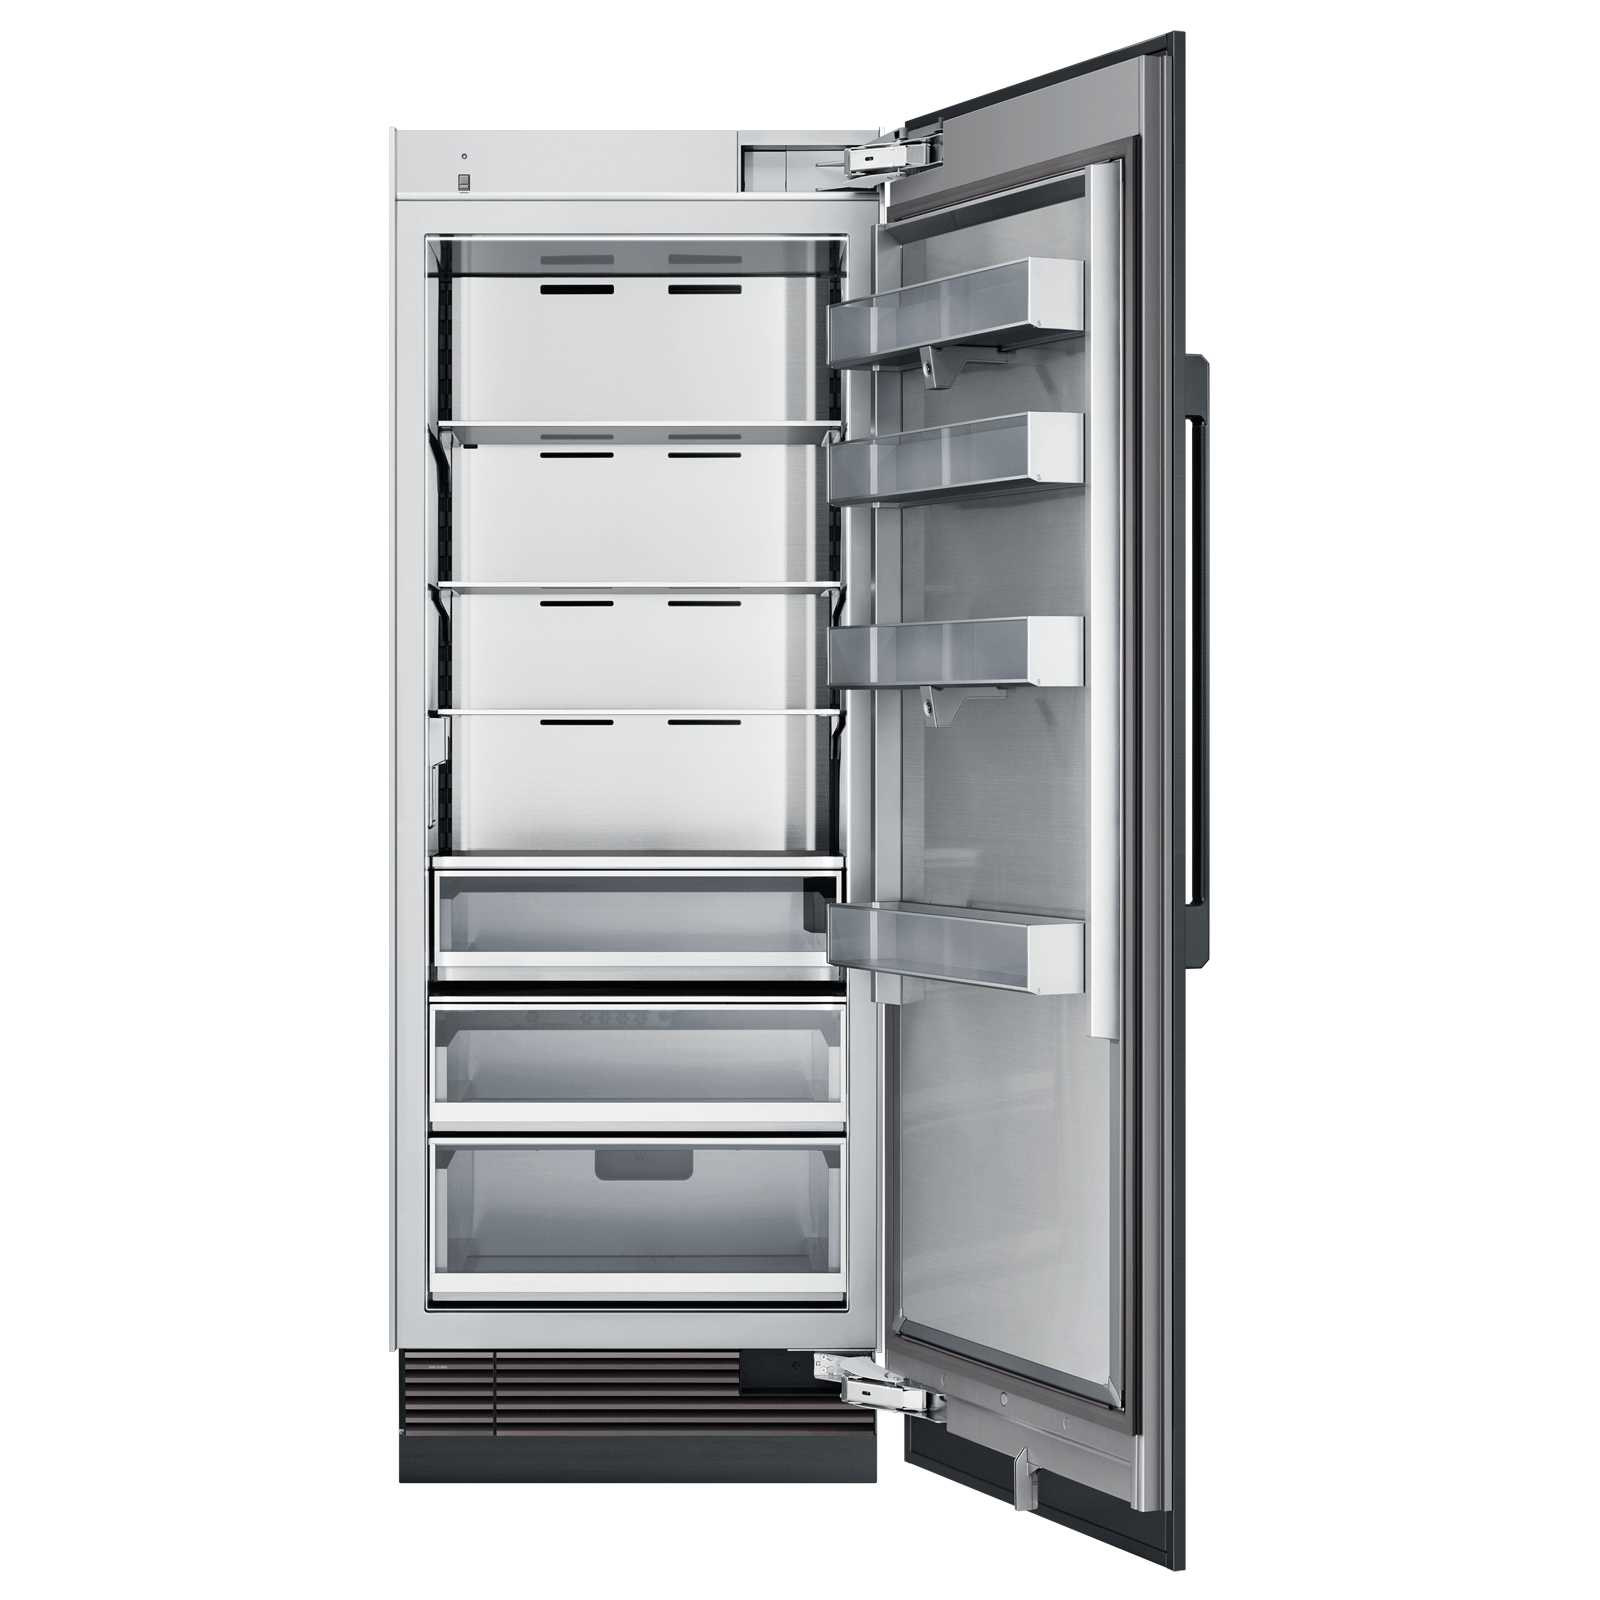 "Model: DRR30980RAP | Dacor 30"" Refrigerator Column, Panel Ready, Right-Hinge"